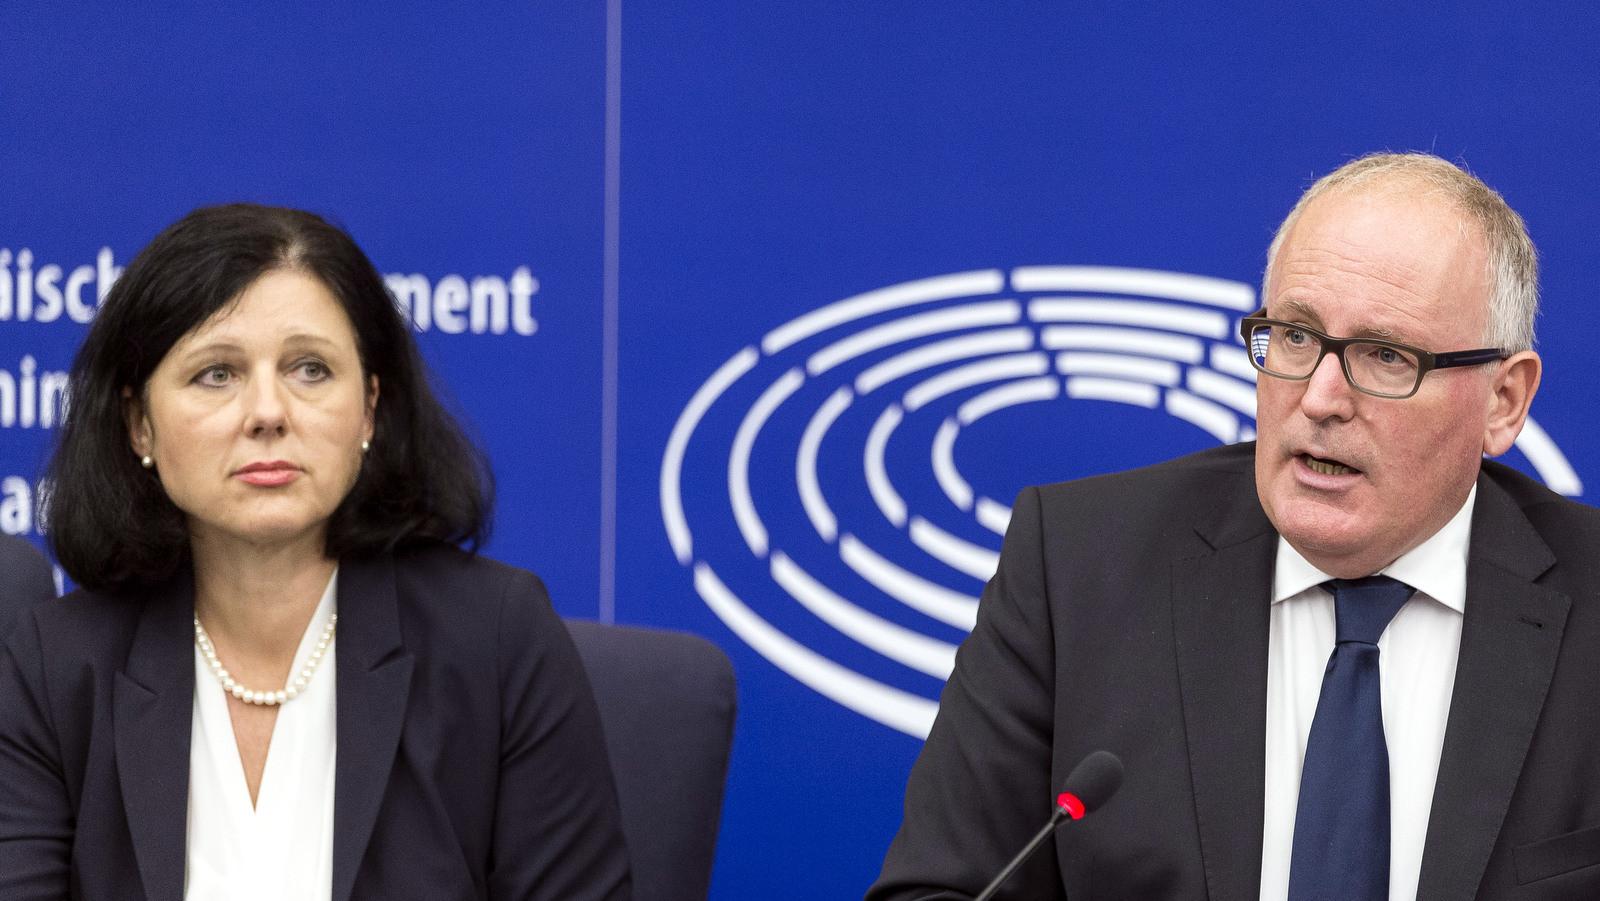 Us Eu Data Sharing Agreement Ruled Invalid Euranet Plus Inside